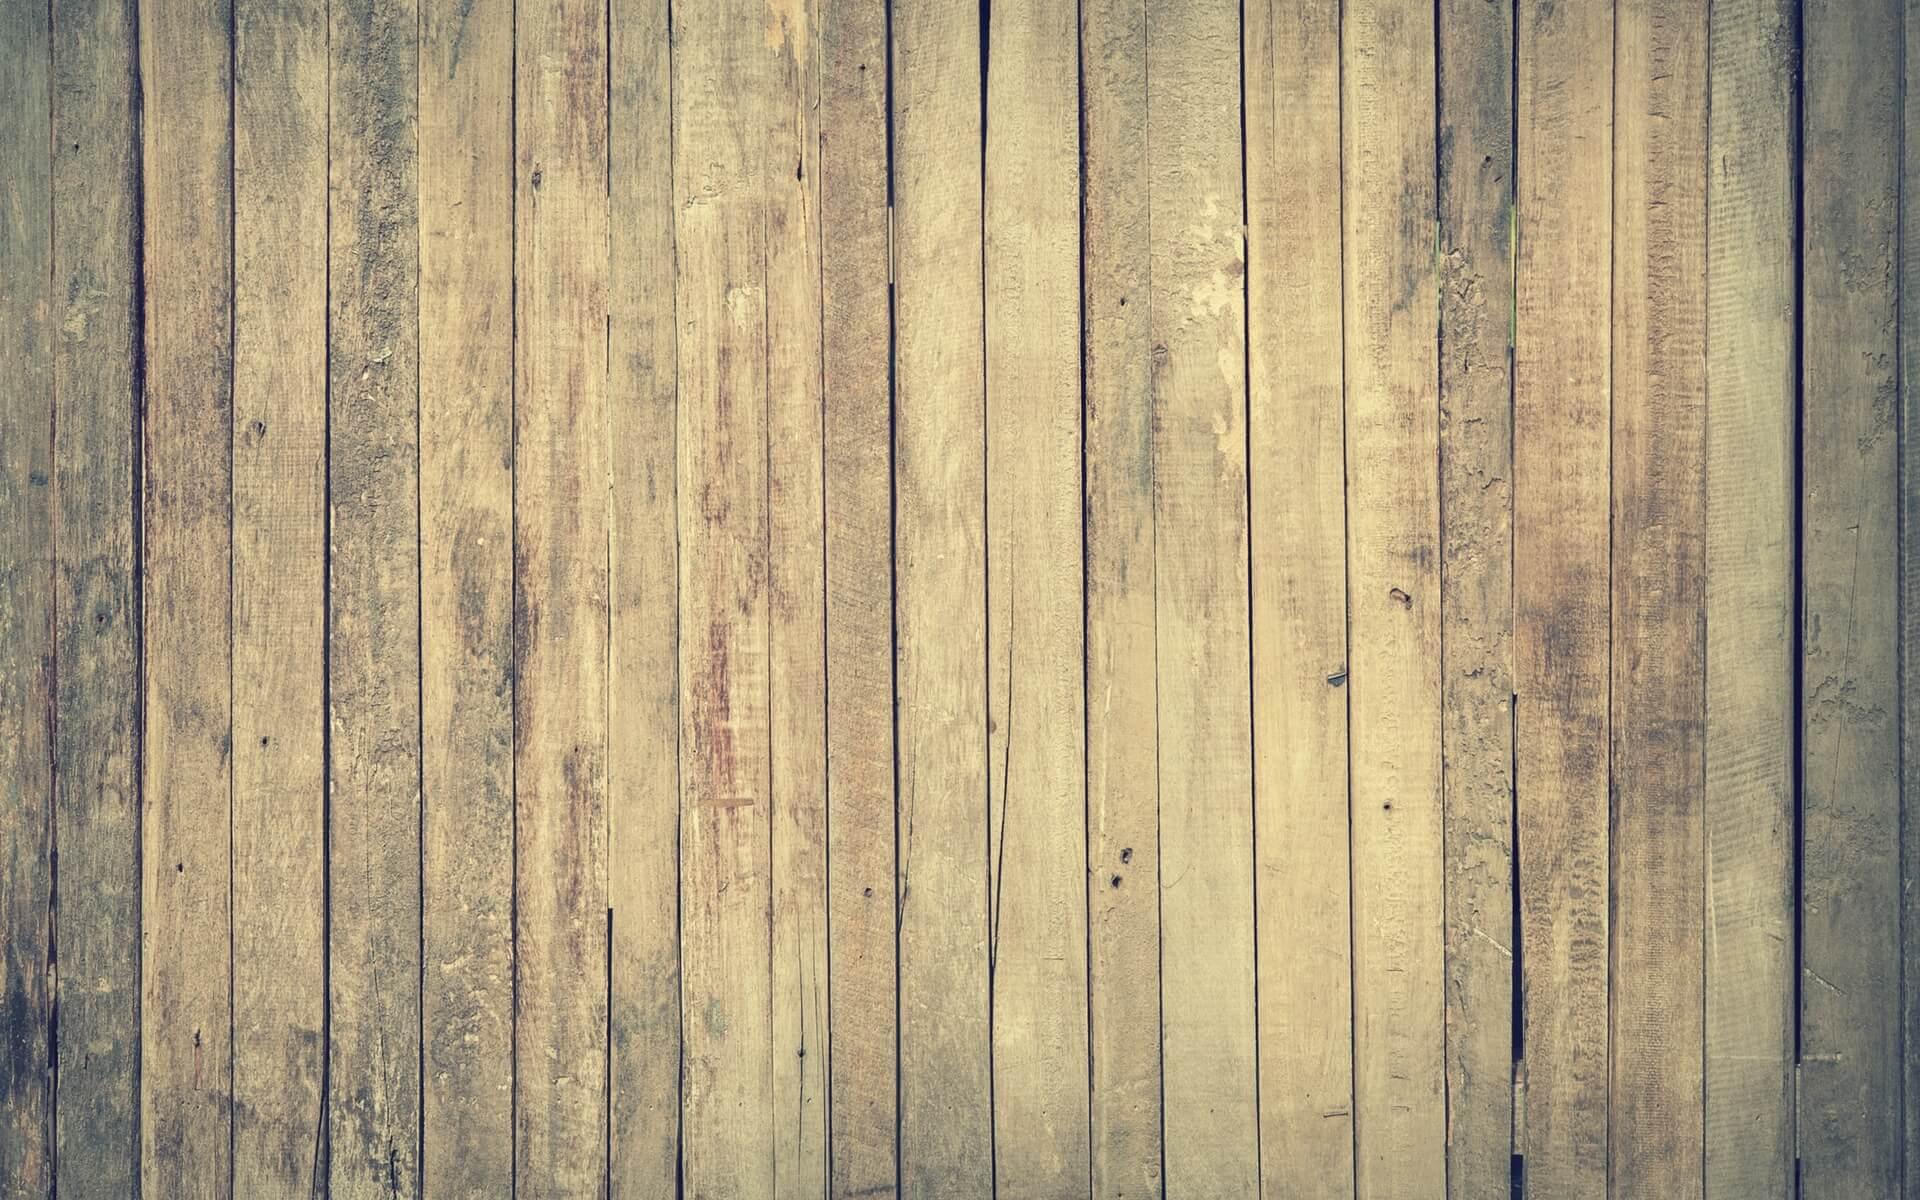 wood wall wallpaper